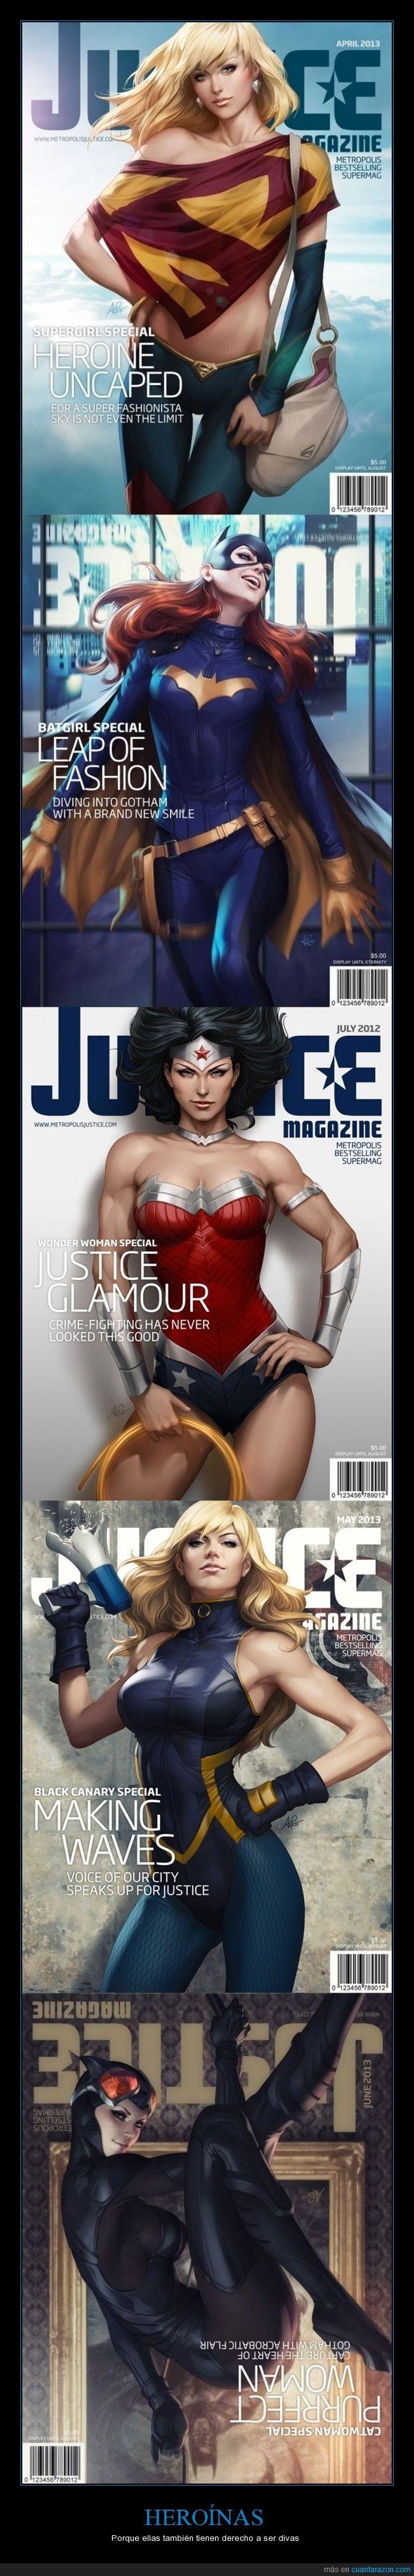 batgirl,black canary,catwoman,cuerpo,divas,heroinas,modelos,superman,wonder woman